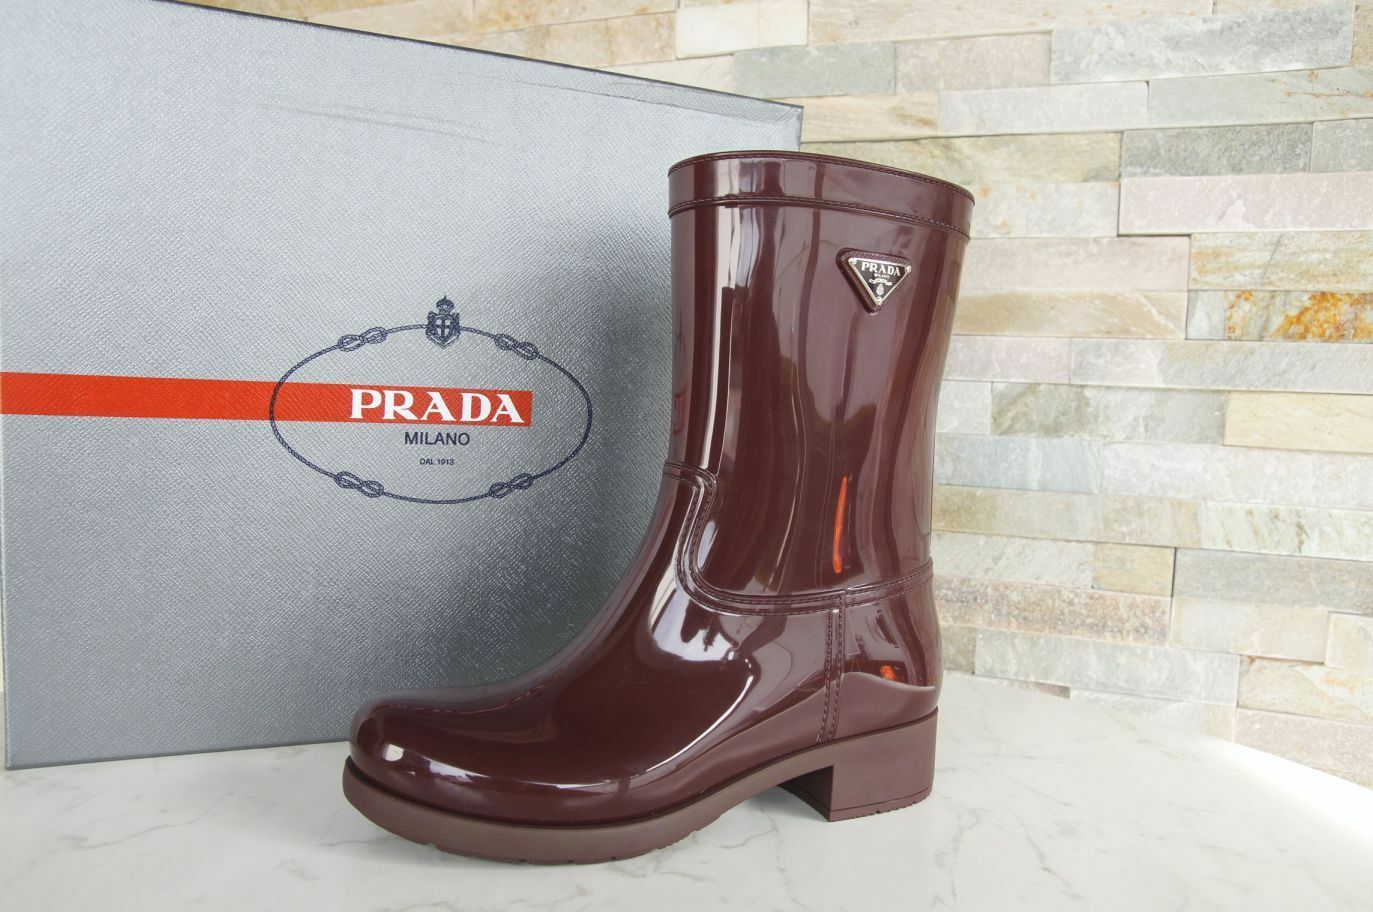 Prada 37 fell botas de goma lluvia rubber rubber rubber botas zapatos burdeos nuevo ex PVP d8dd41